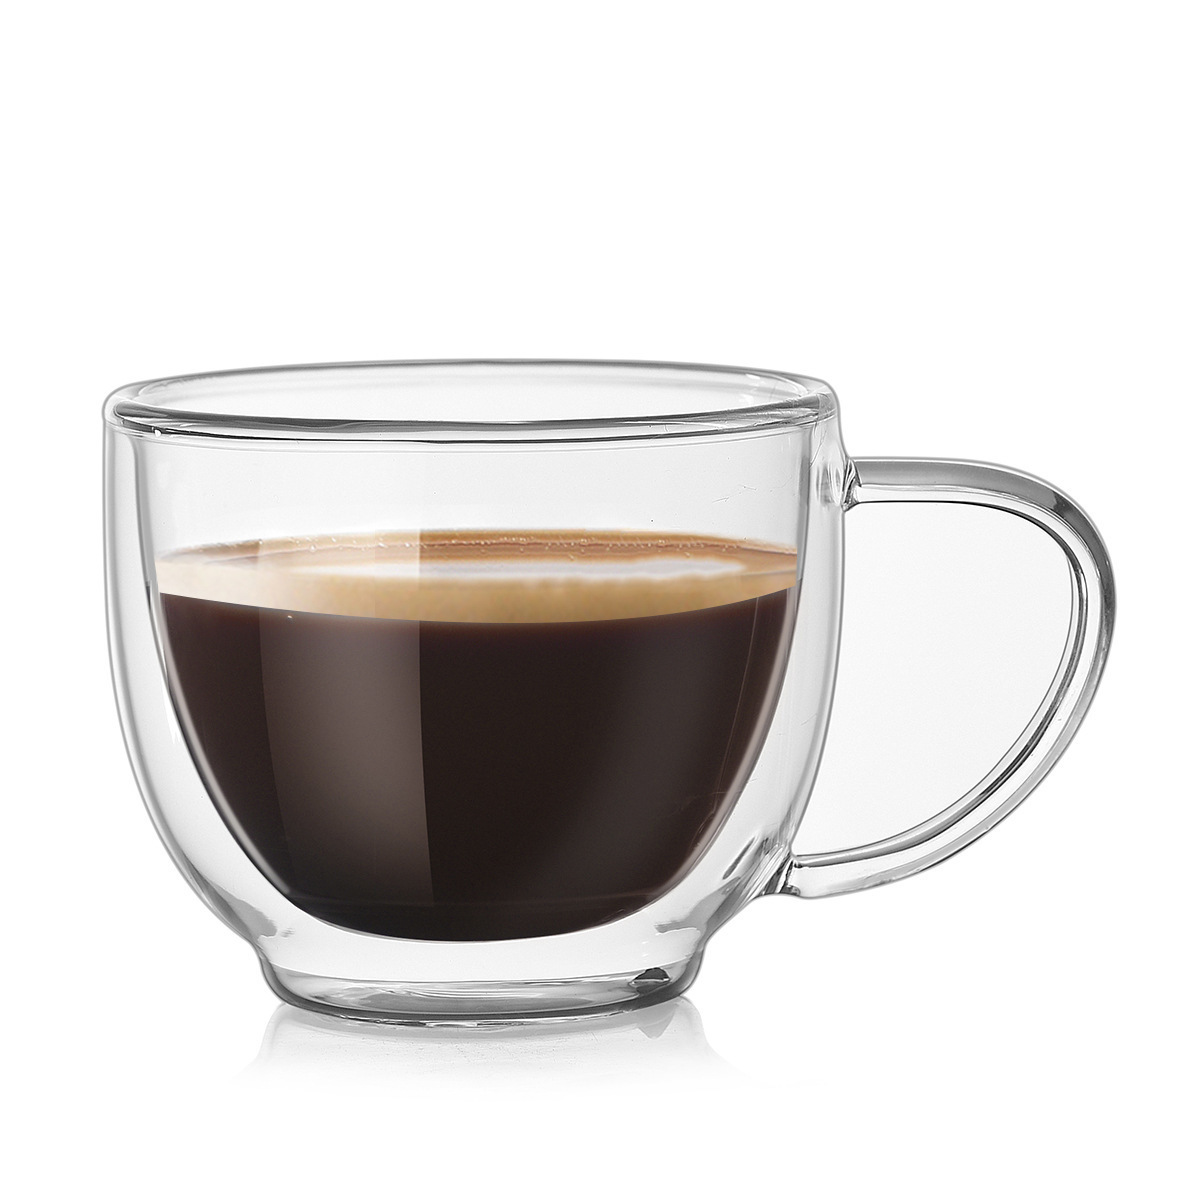 200ml Clear Double Walled Glass Espresso Cappuccino Cup Tasse Domestic Latte Coffee Mug Caneca Taza Cafe Gato Xicara Tea Glasses Mugs Aliexpress